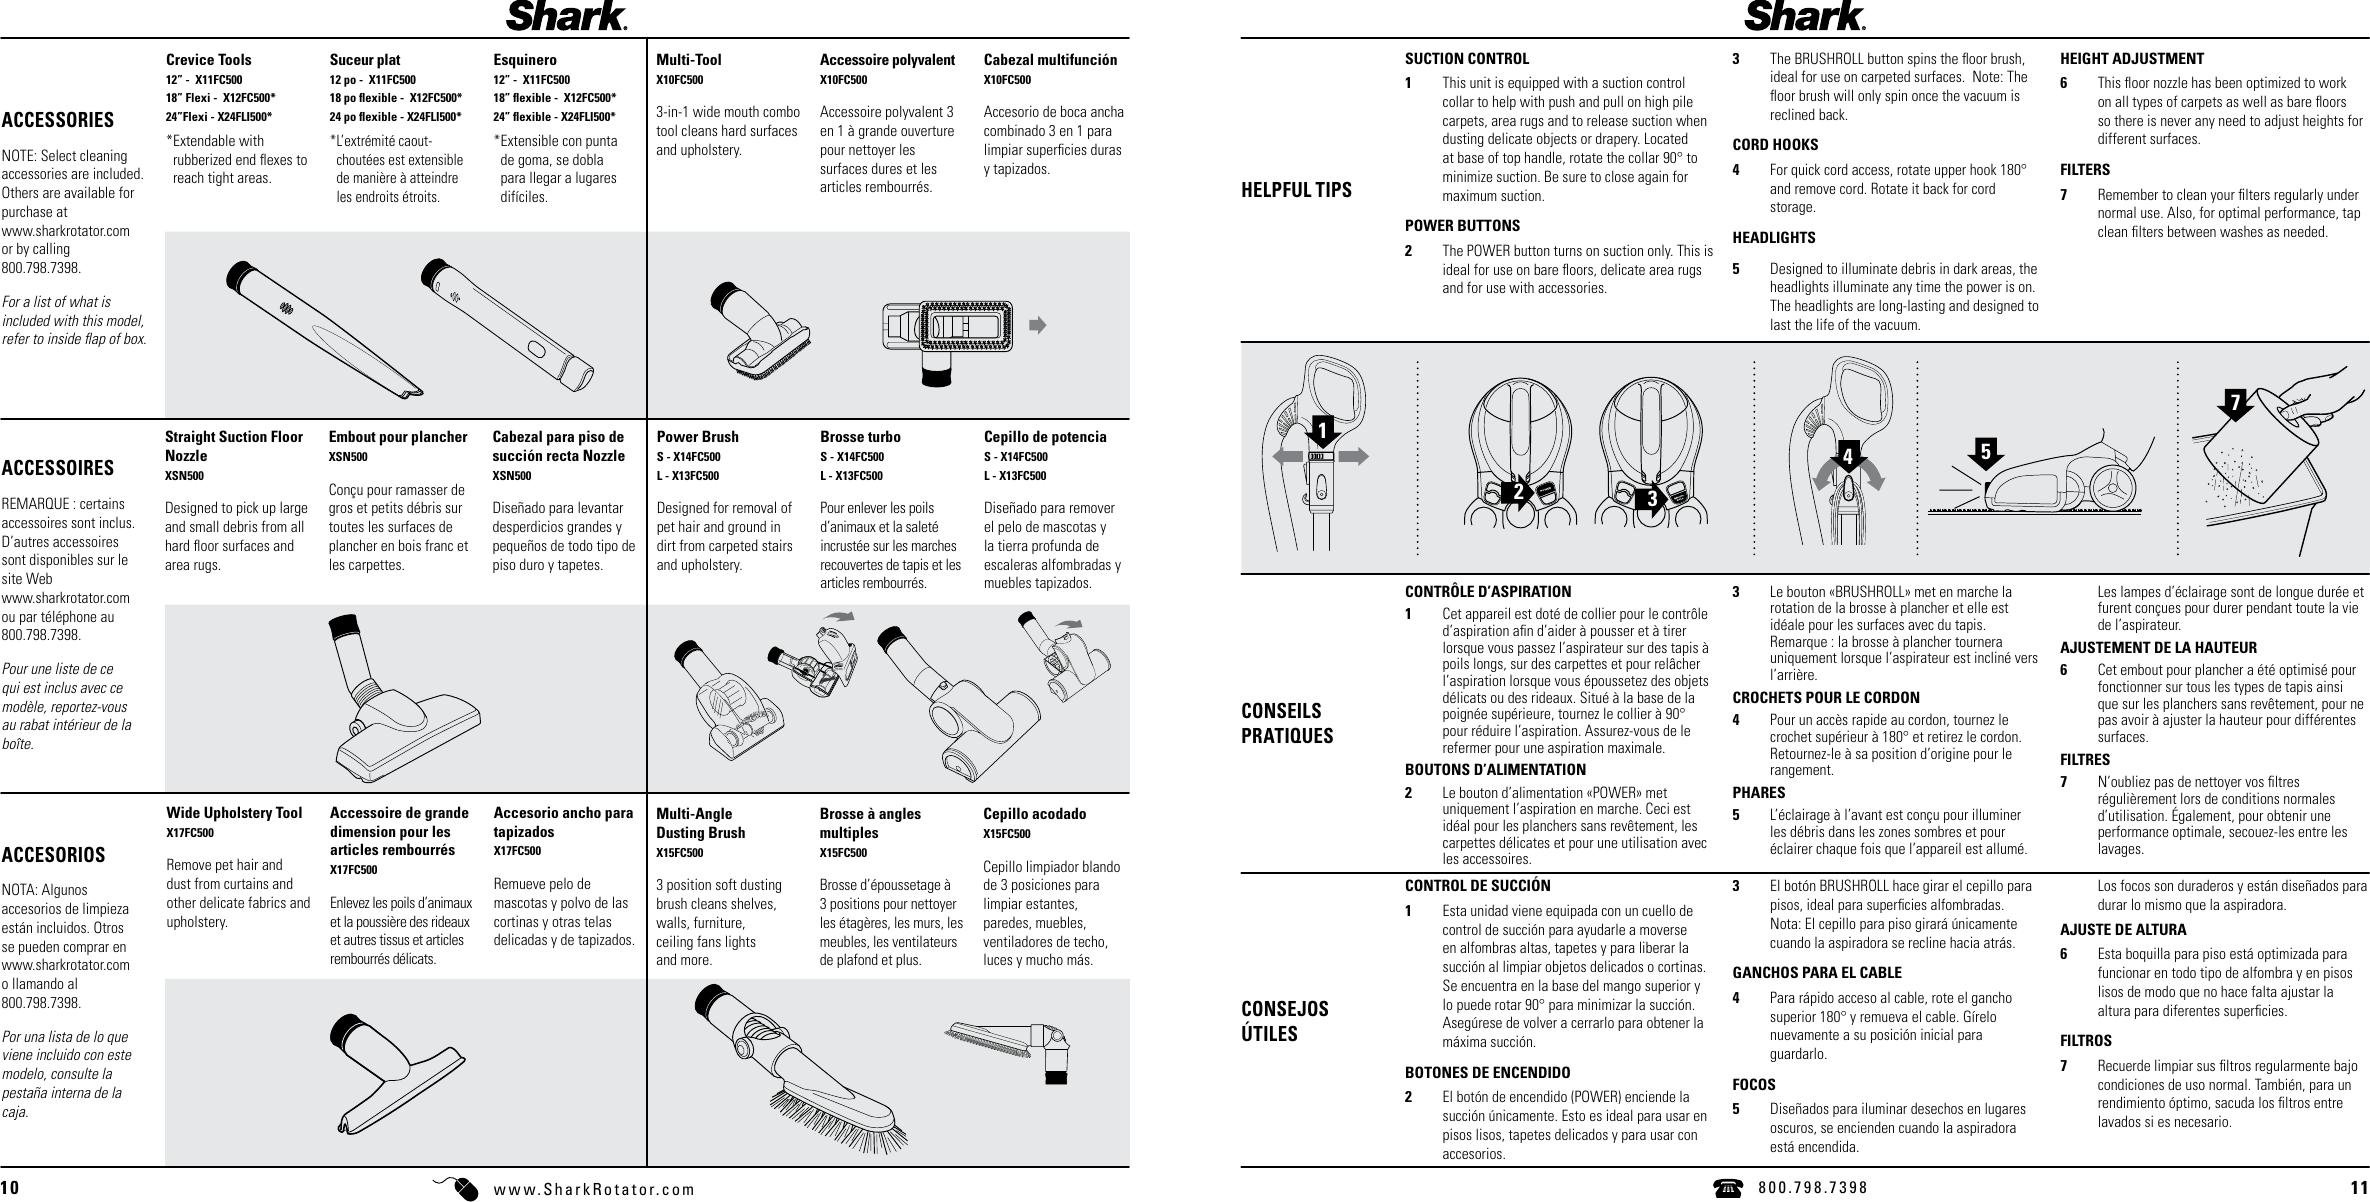 Shark Rotator Professional Lift Away Nv501 Users Manual Manual Guide